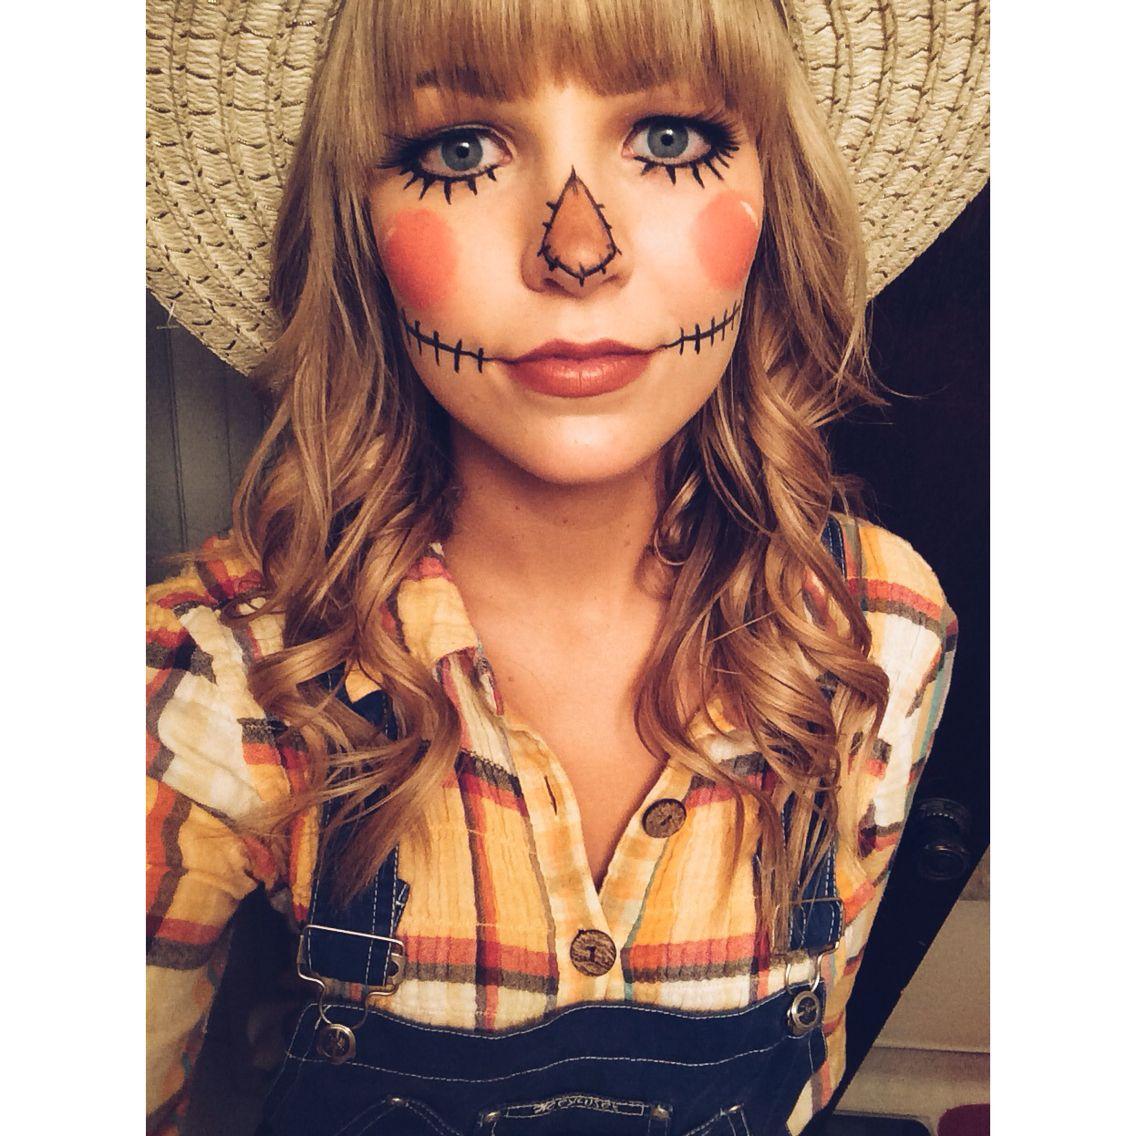 Scarecrow makeup | h o l i d a y s | Pinterest | Scarecrow makeup ...